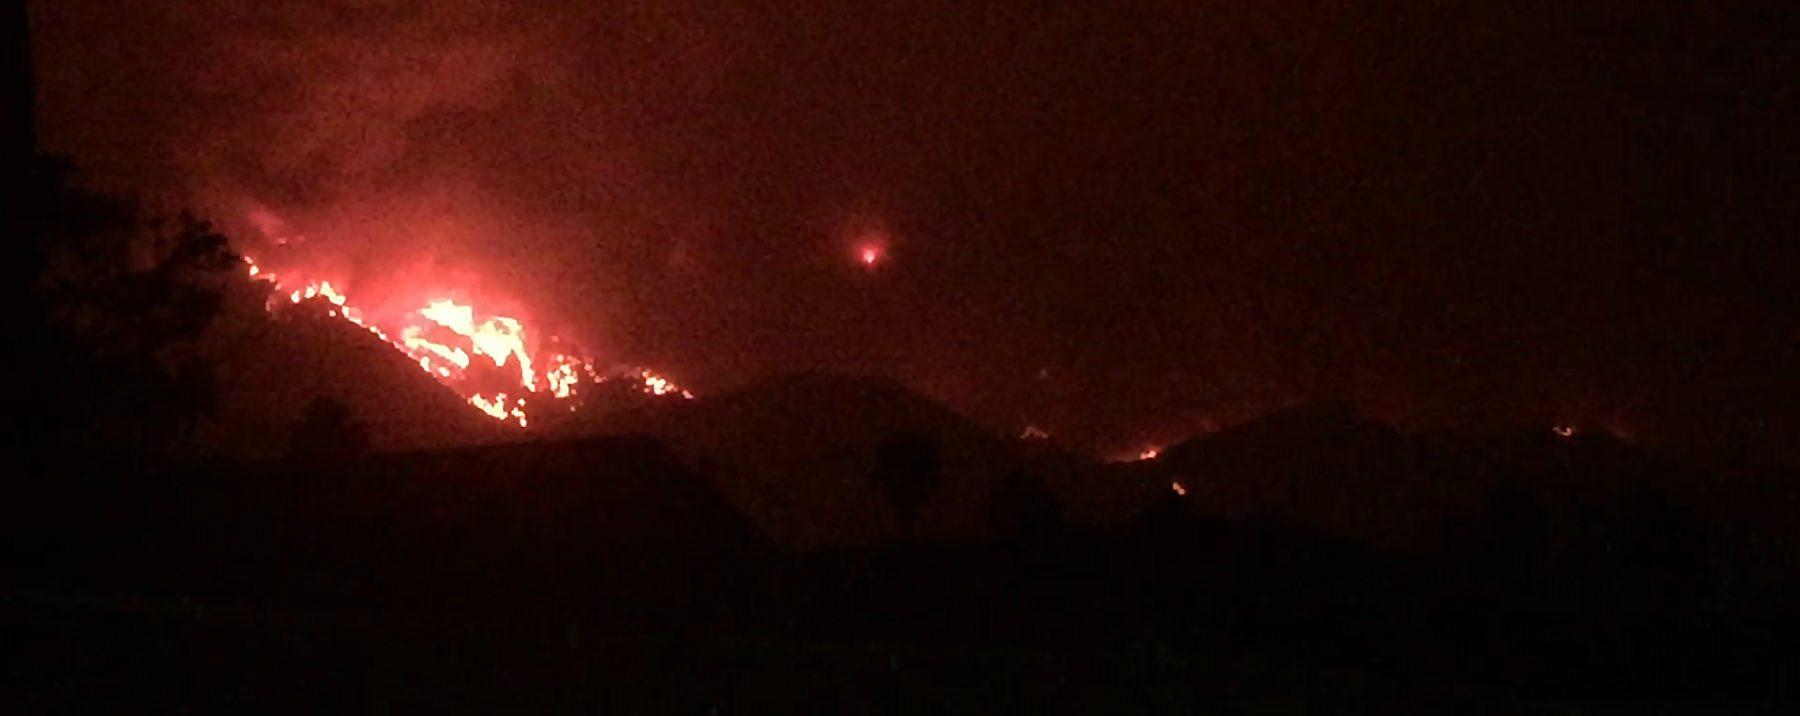 Key Wildfire/Mudslide Resource Links